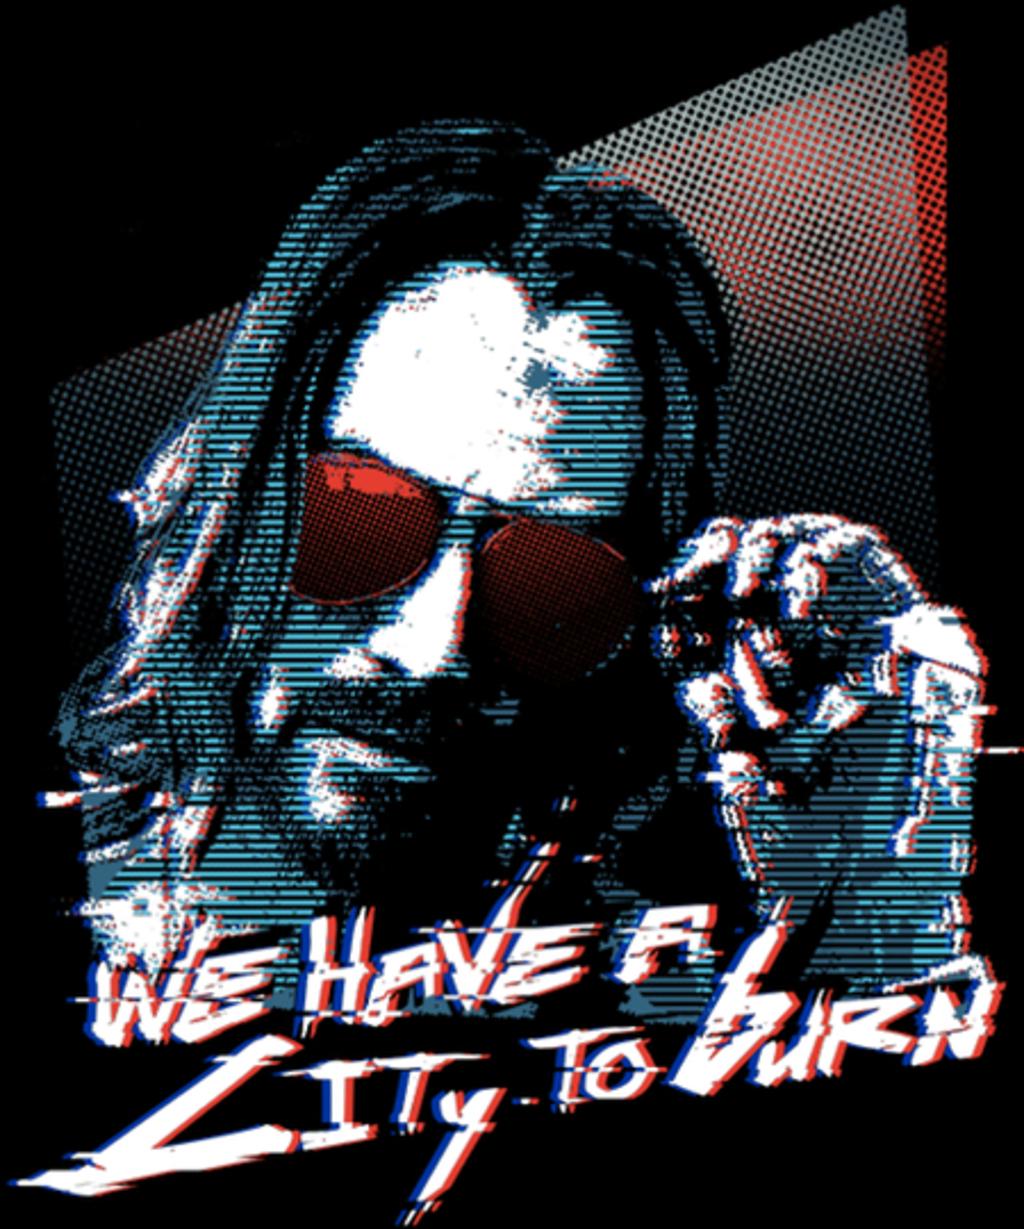 Qwertee: Cyberpunk Keanu